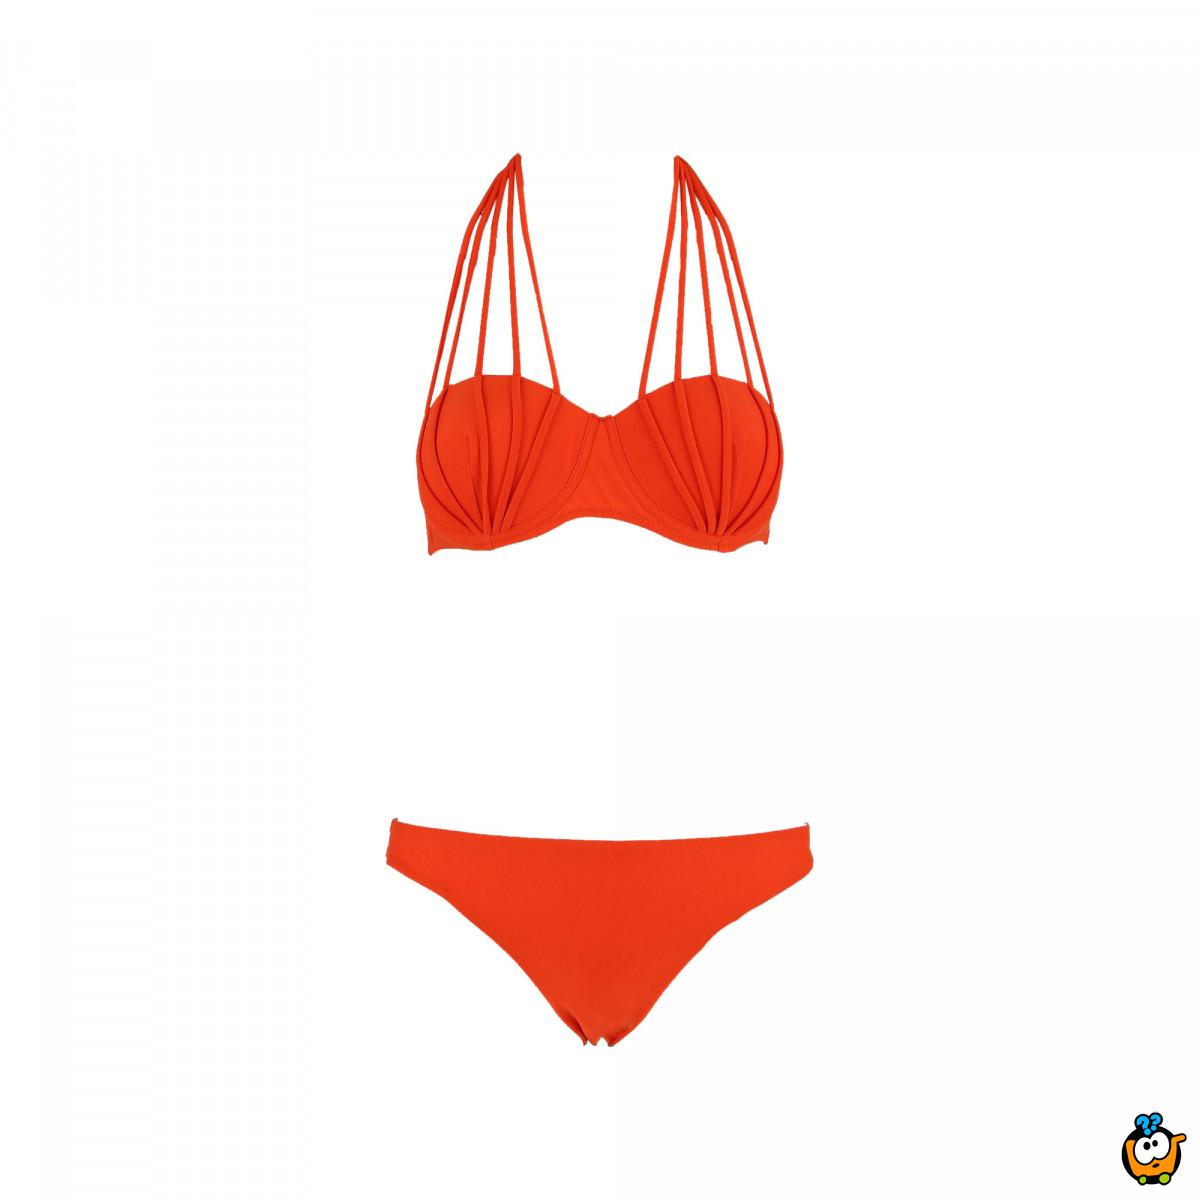 Dvodelni ženski kupaći kostim - BUST UP ORANGE